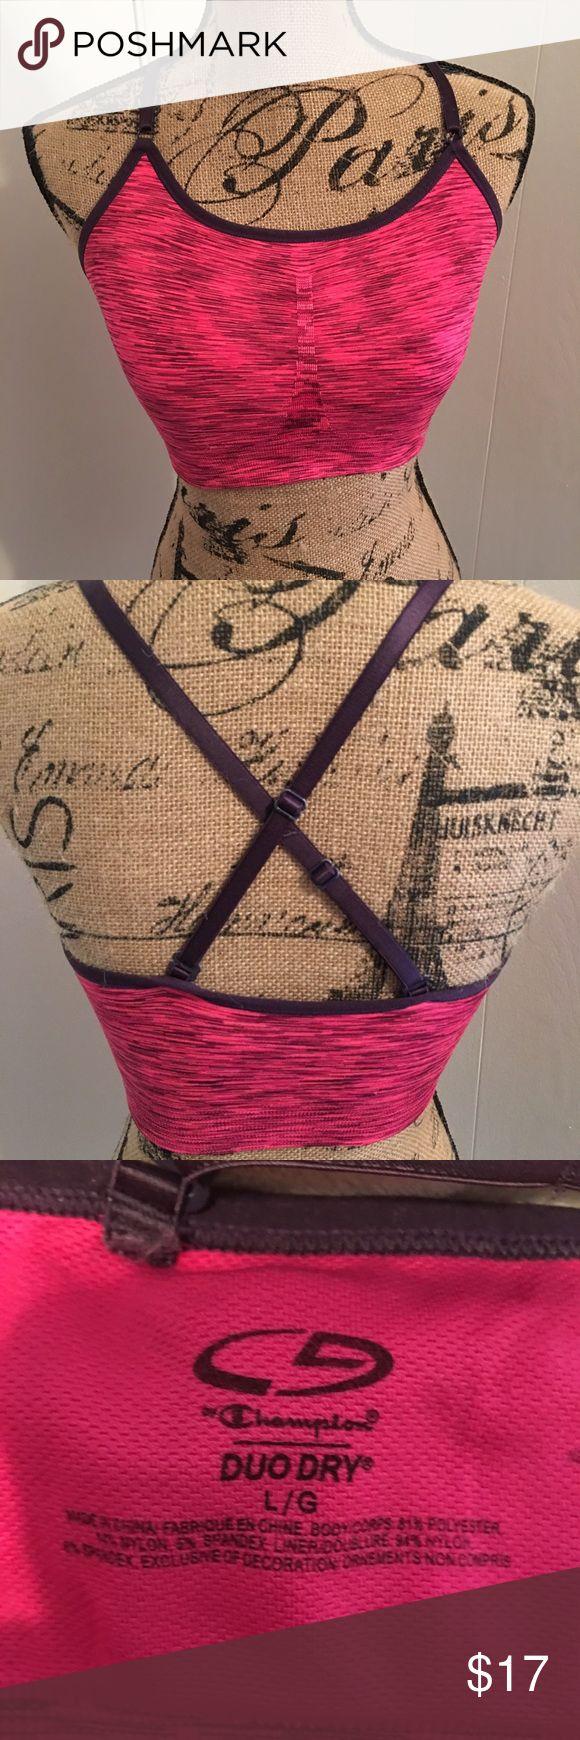 Champion sports bra w/ cross-cross back Adorable pink & purple sports bra with cross back! Brand new condition Champion Intimates & Sleepwear Bras